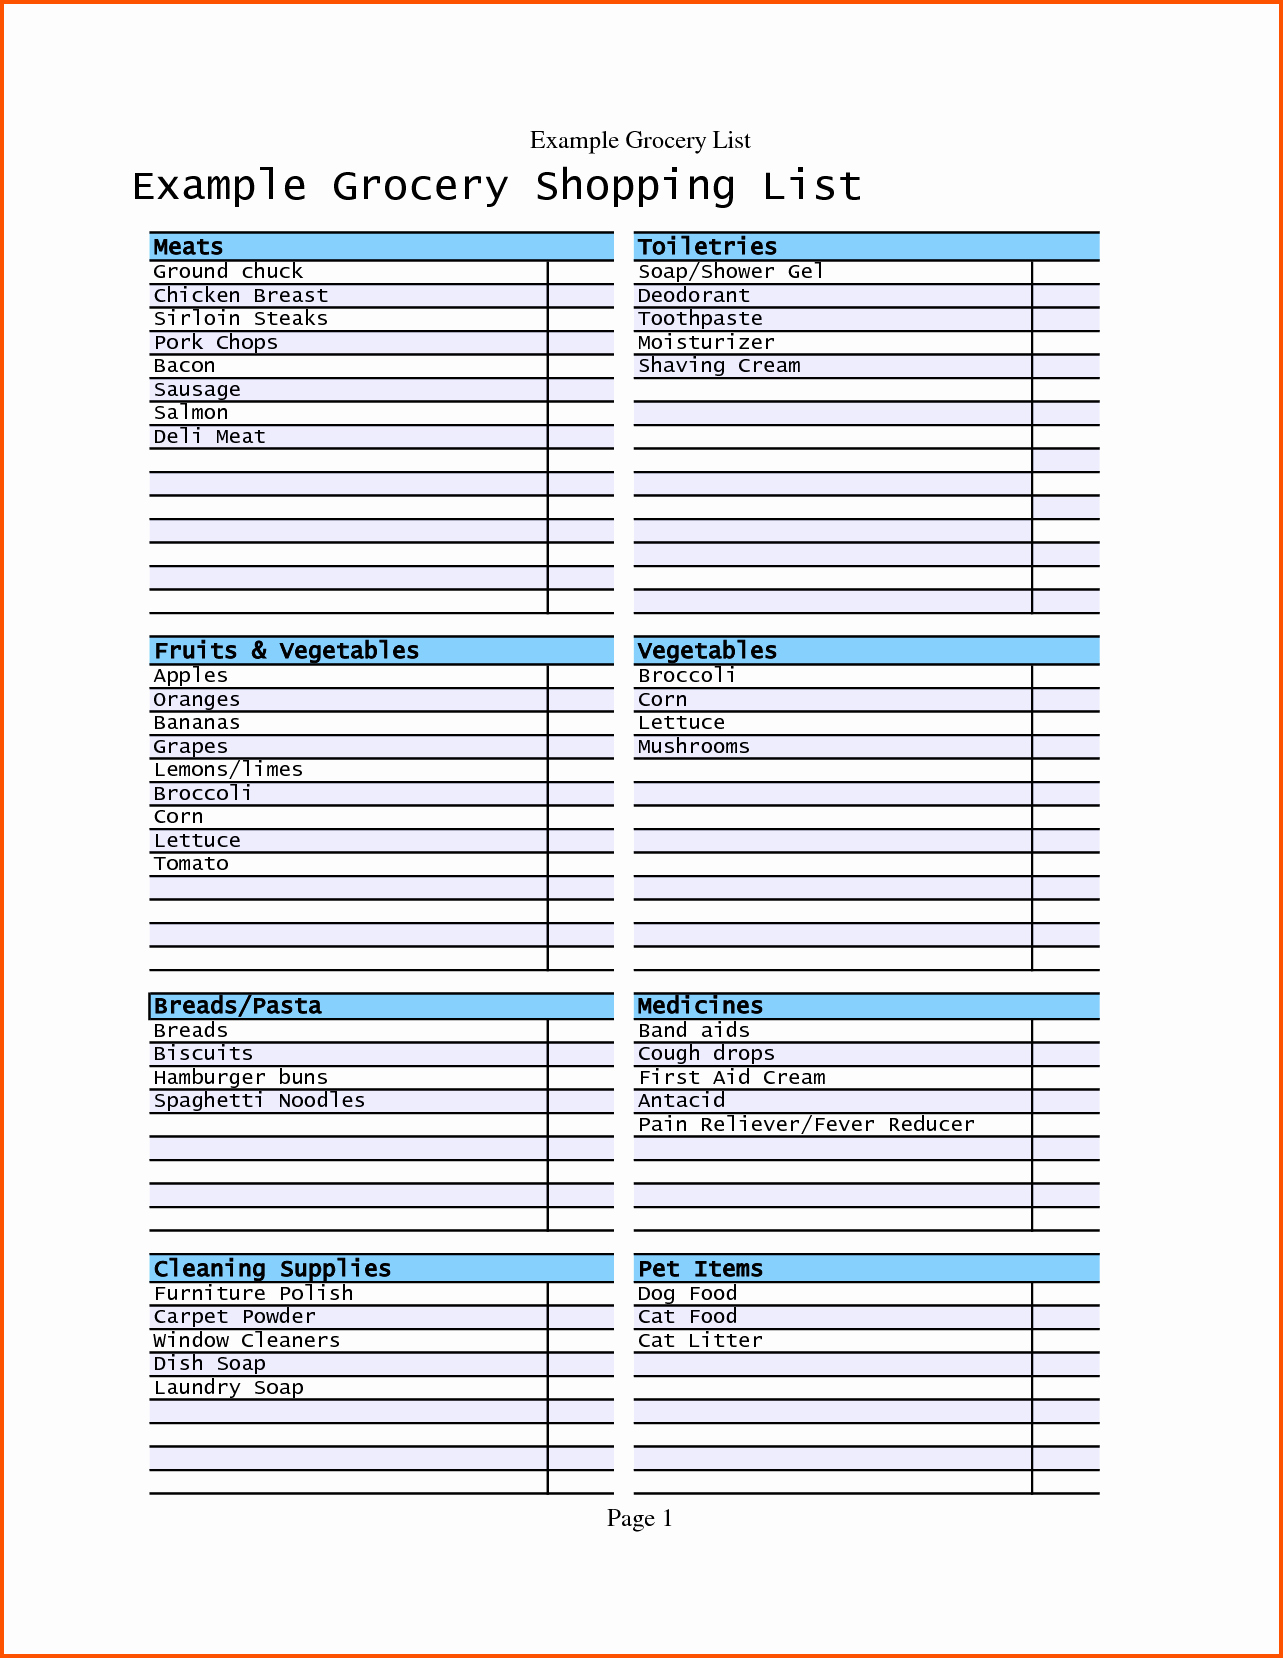 Shopping List Template Excel Inspirational Grocery Checklist Template Portablegasgrillweber